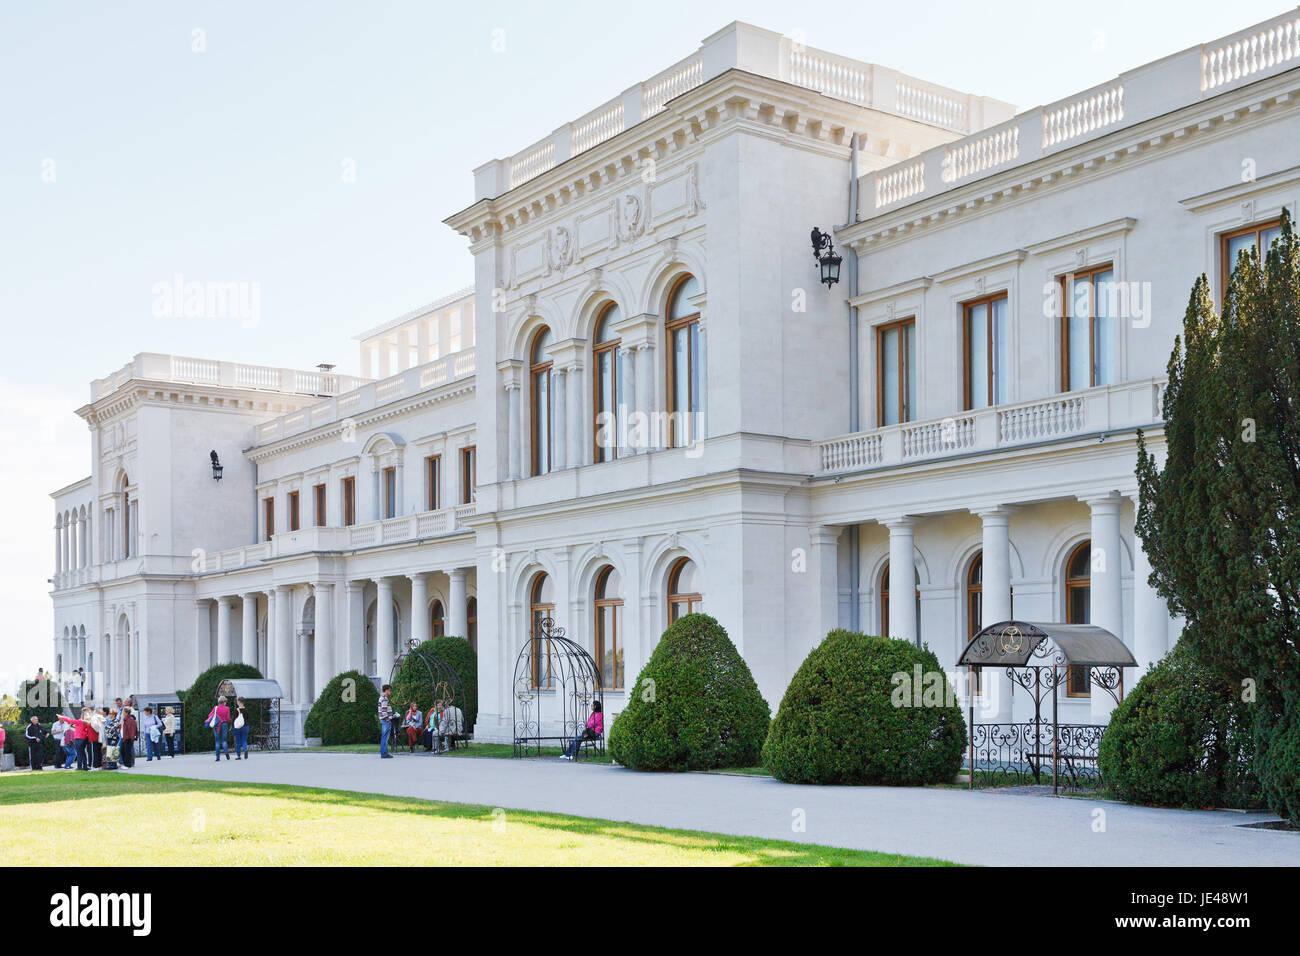 YALTA, RUSSIA - SEPTEMBER 28, 2014: tourists near Grand Livadia Palace in Crimea. Livadia estate was summer residence - Stock Image